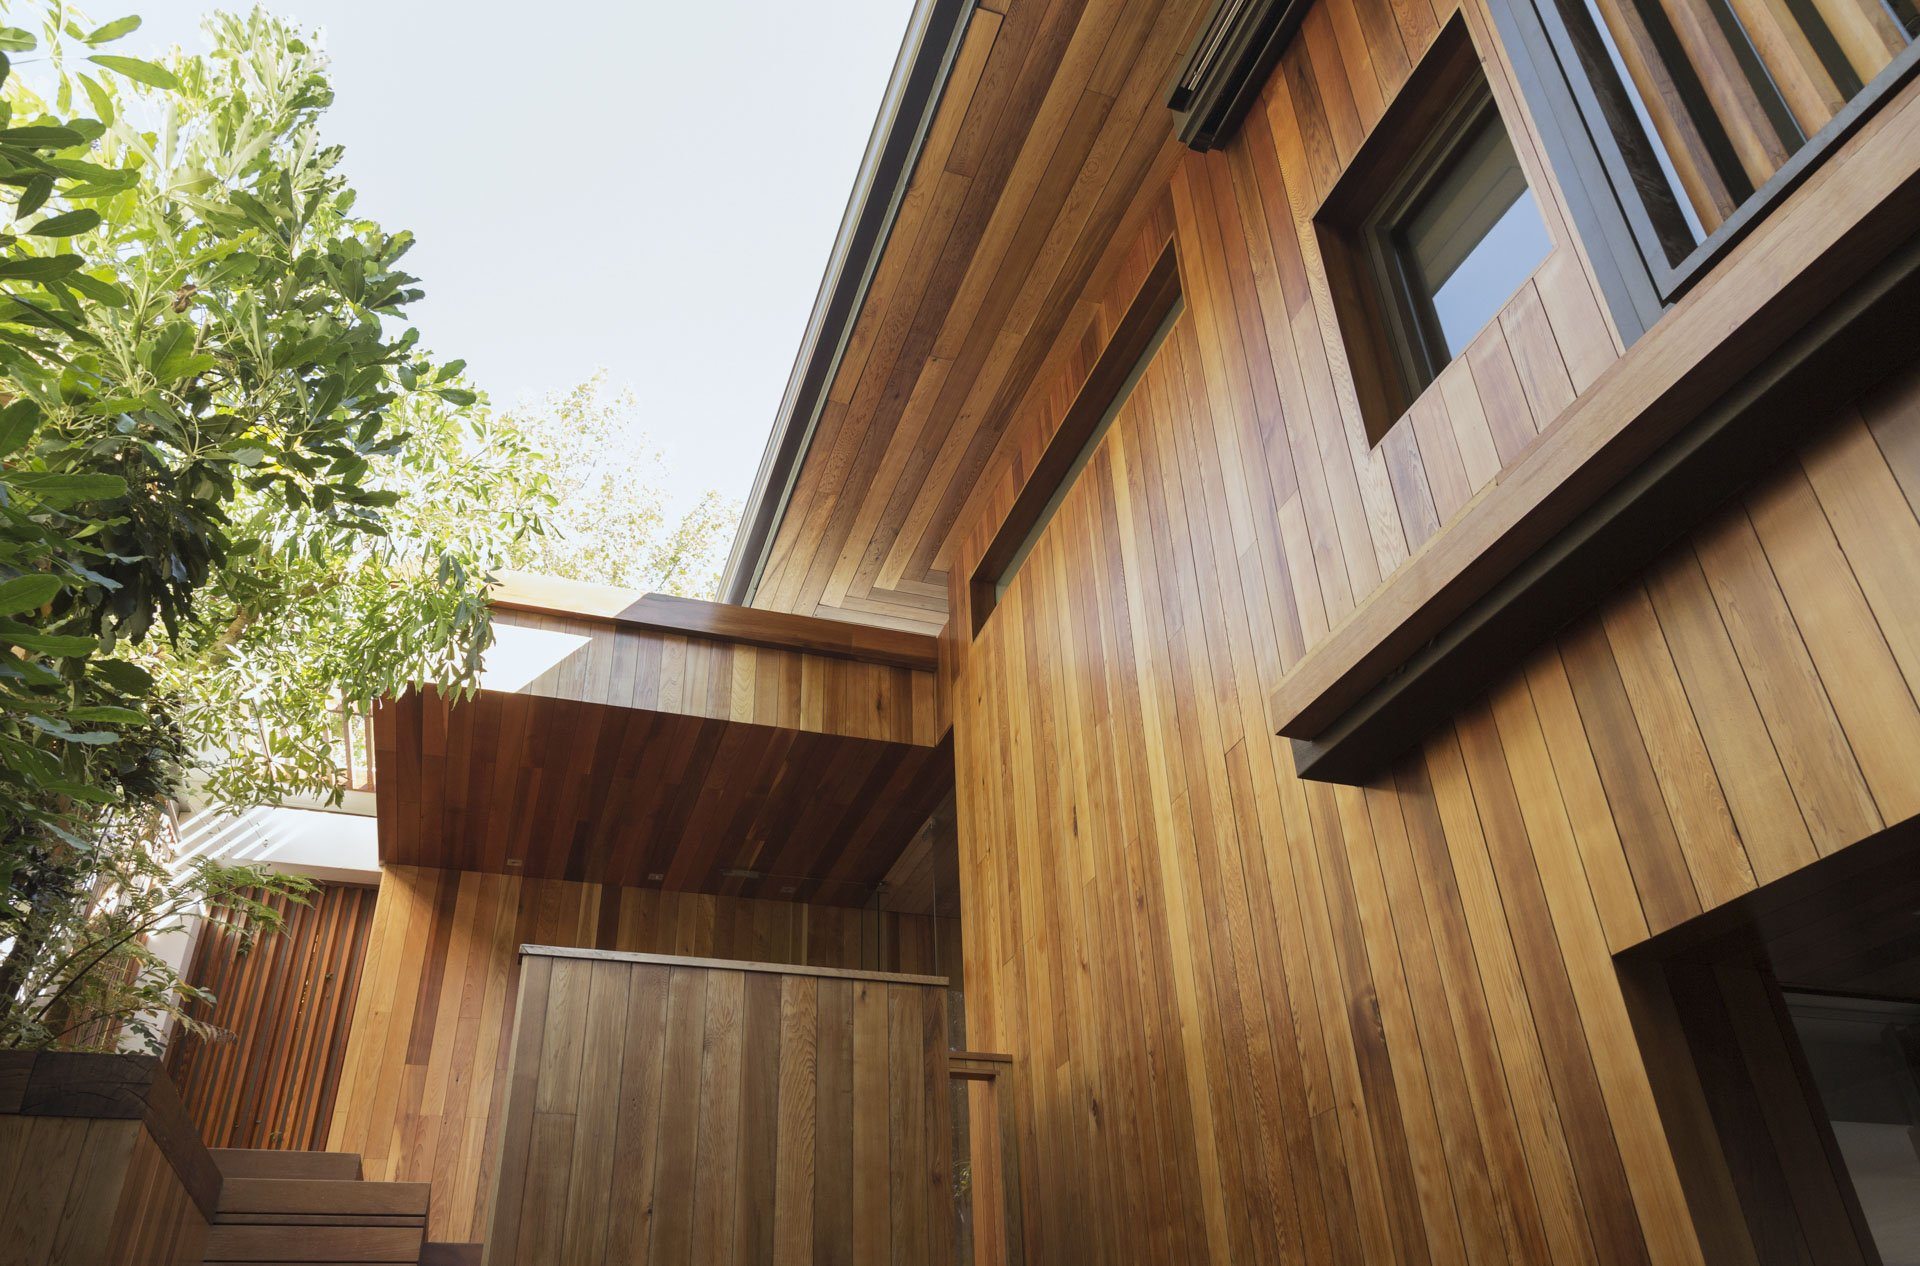 Custom wood design from locally sourced wood in La Posta, Florida Colorado